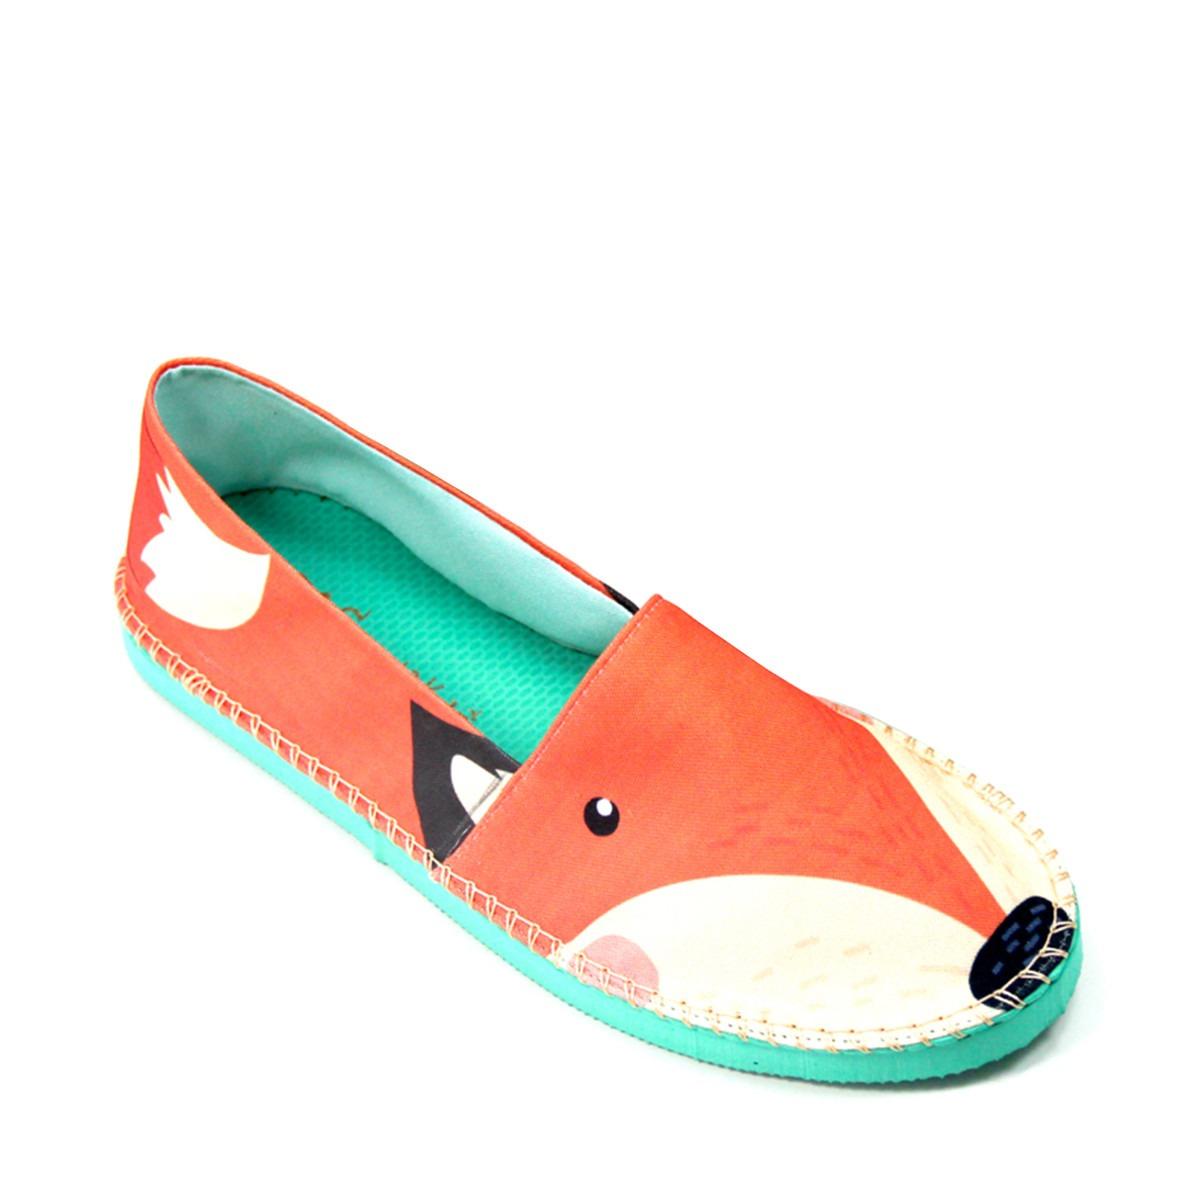 8a0923f3b Alpargata Puppy Fox (raposa) - Cup Shoes - R$ 89,90 em Mercado Livre